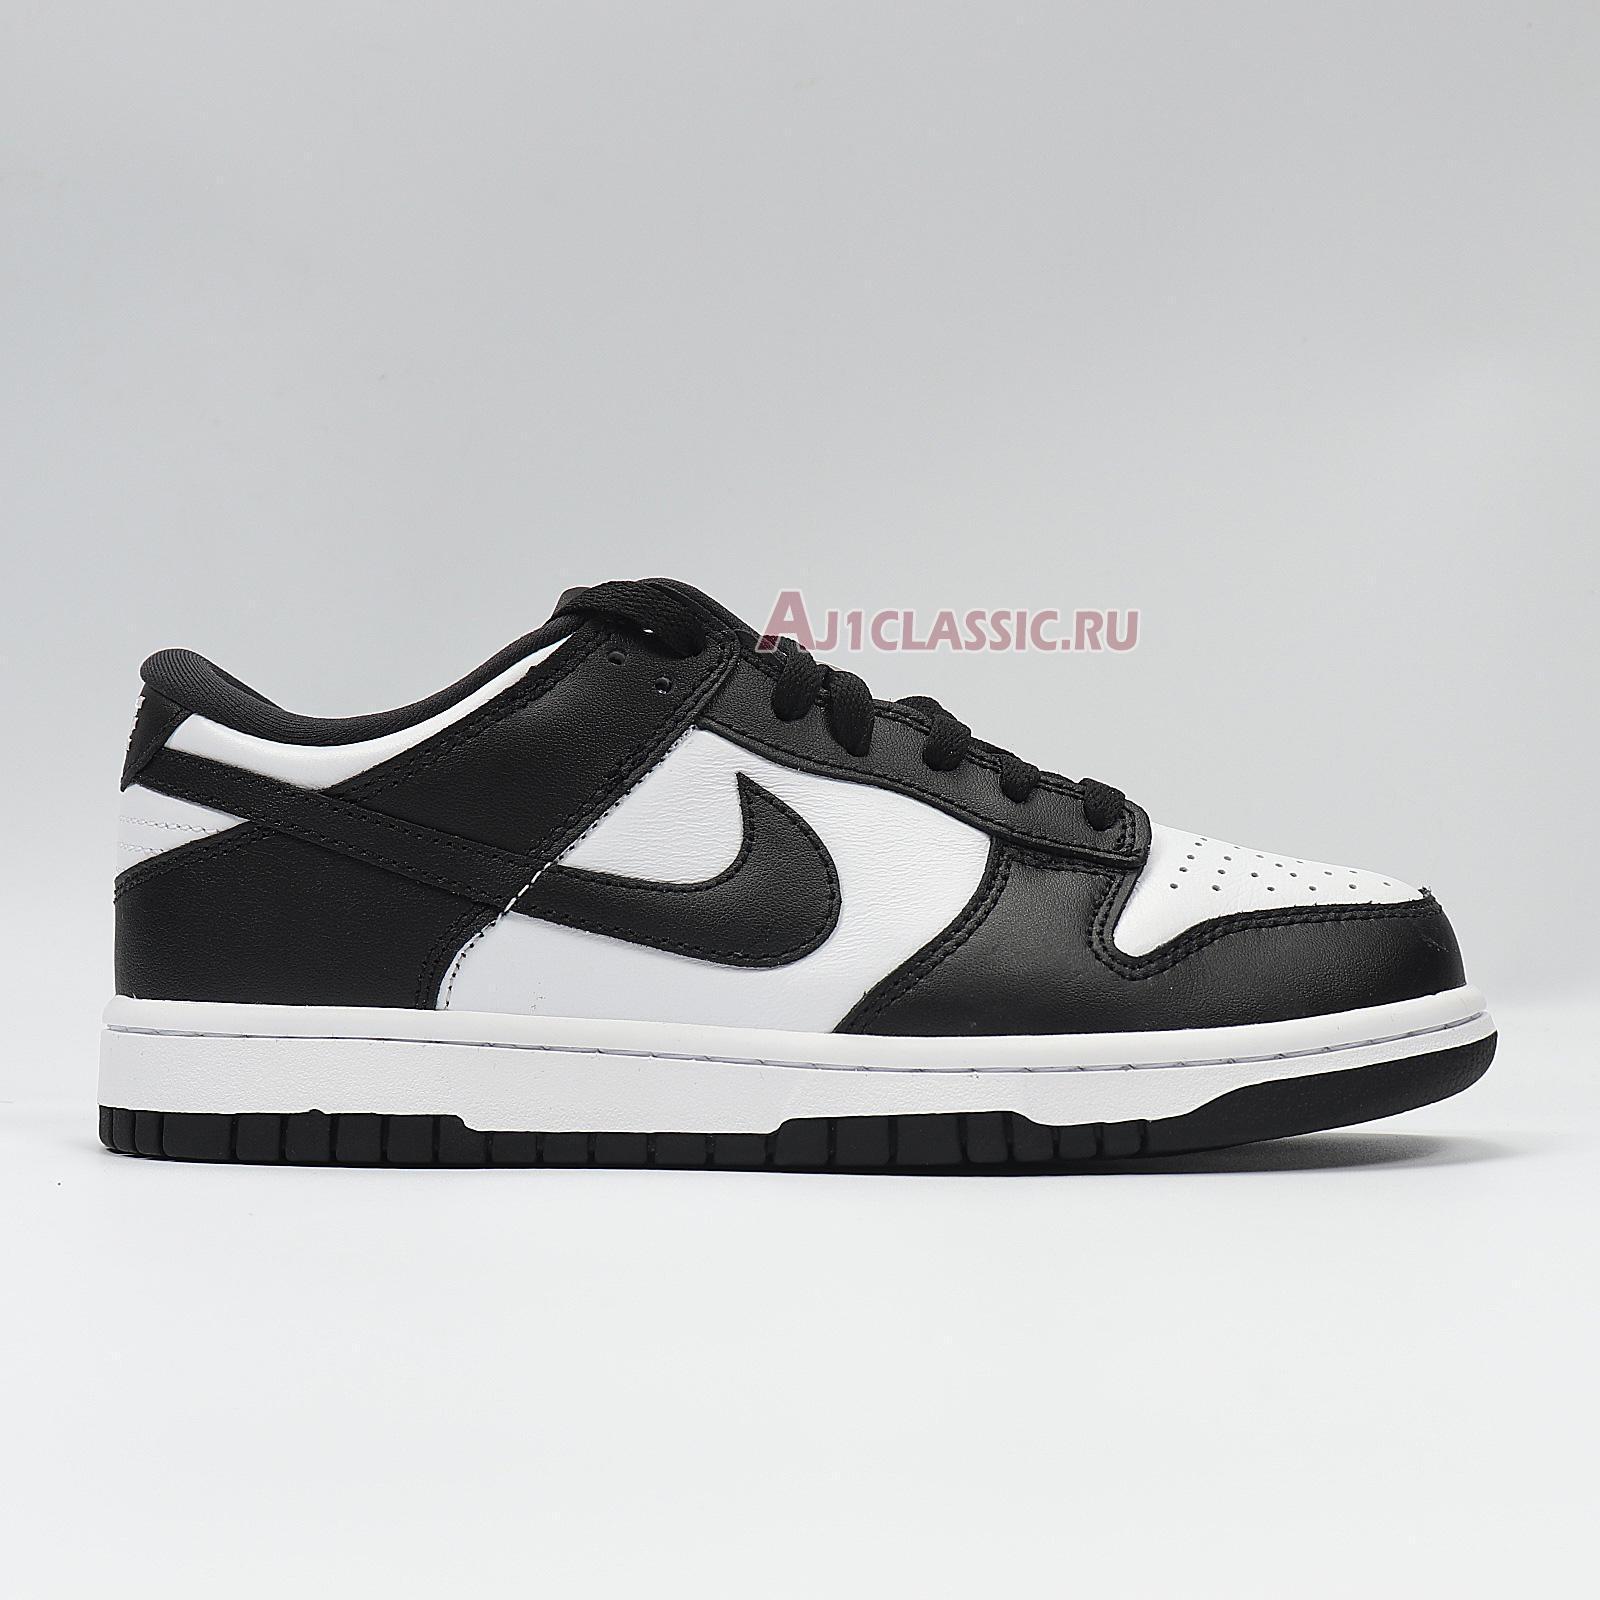 "Nike Dunk Low Retro SP ""Black"" CU1726-001"